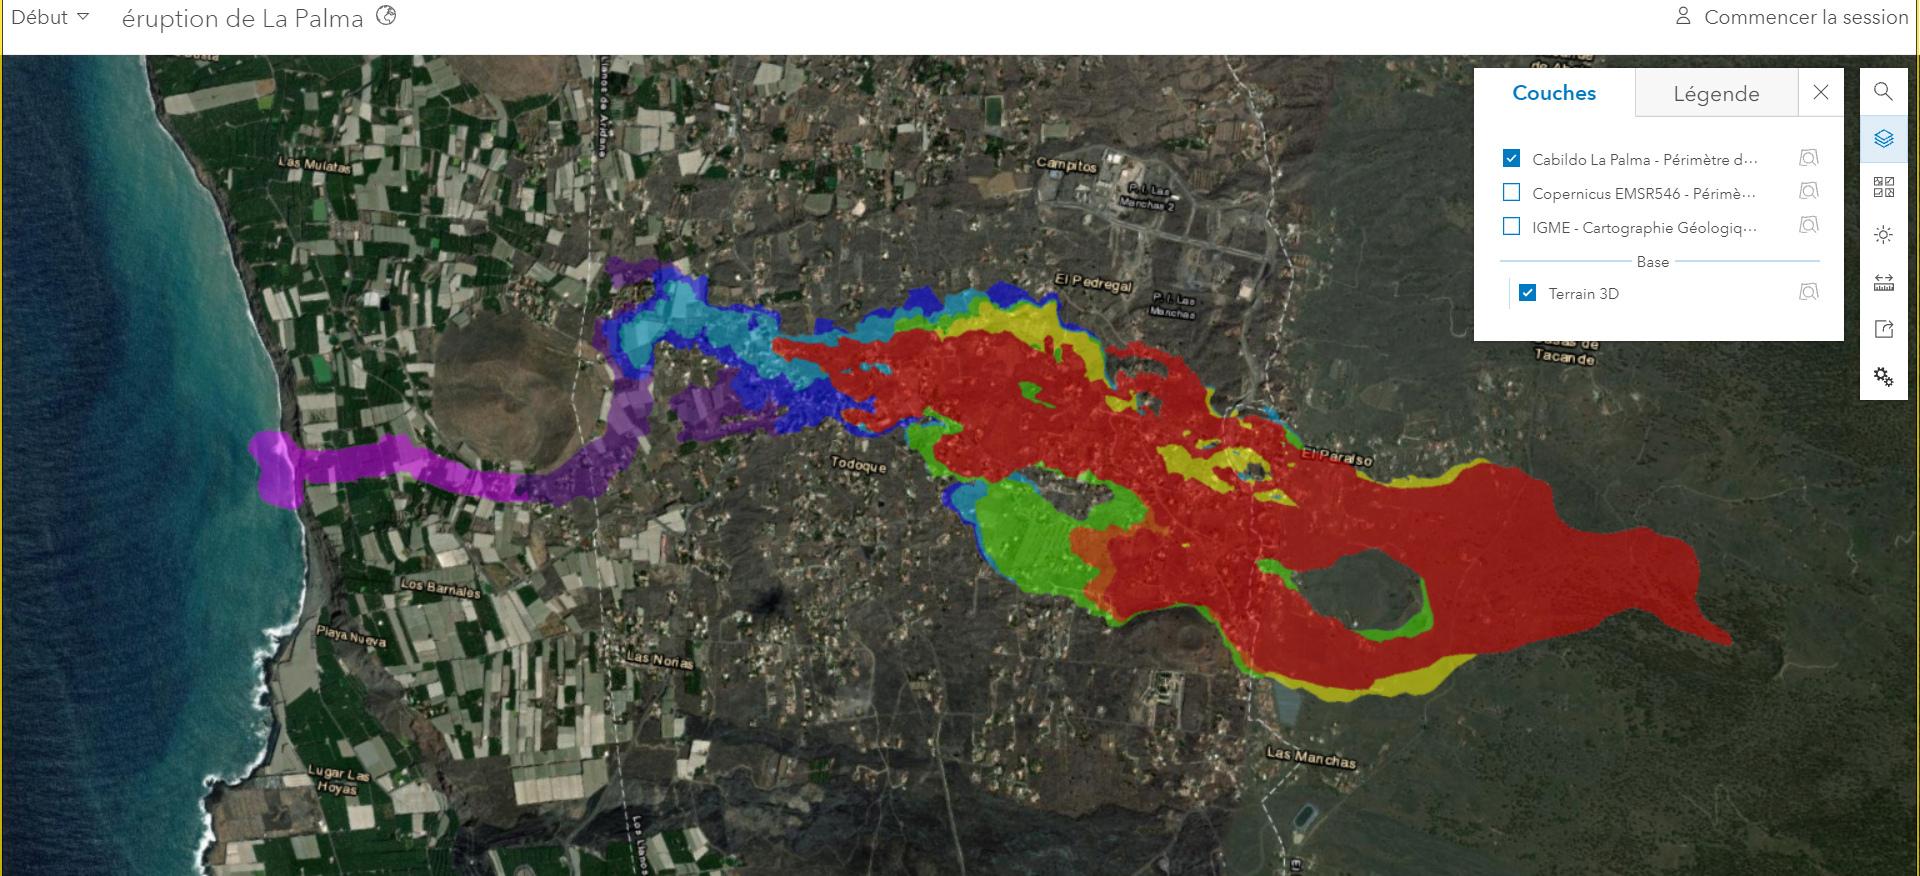 Eruption du volcan Cumbre Vieja - Ile de Palma - Canaries 20210919